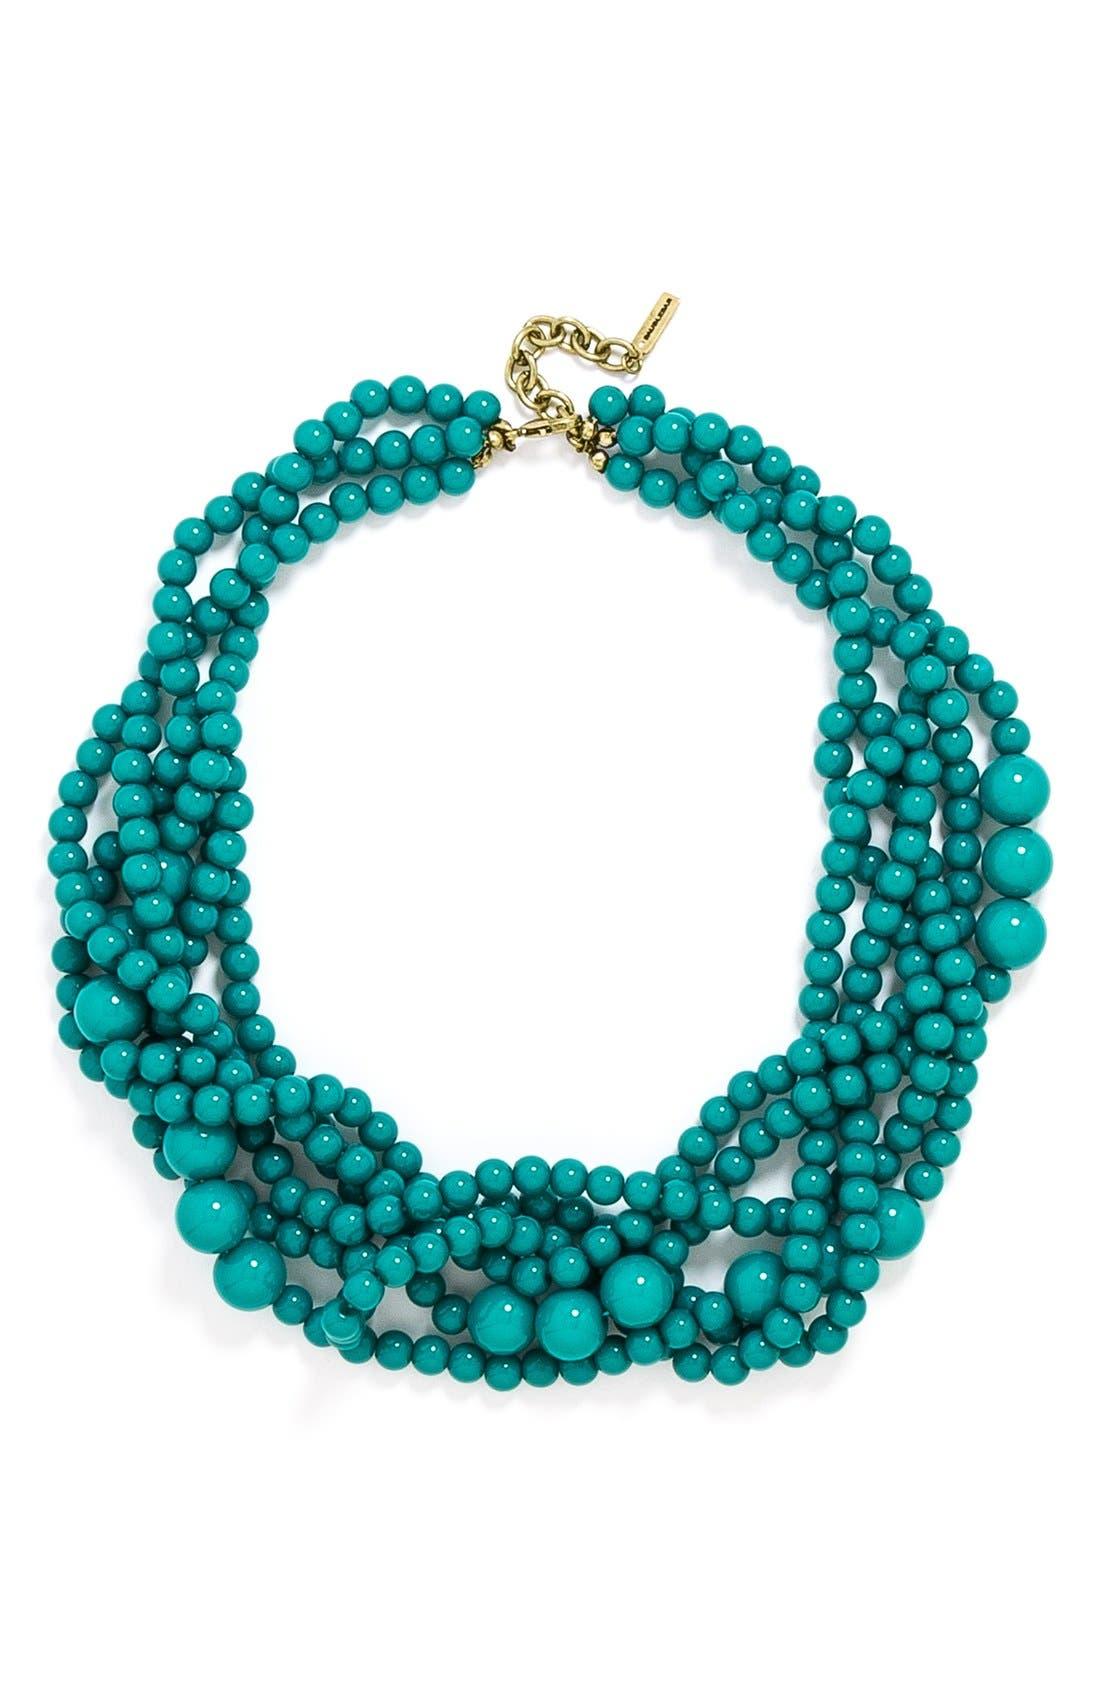 Main Image - BaubleBar 'Bubblestream' Collar Necklace